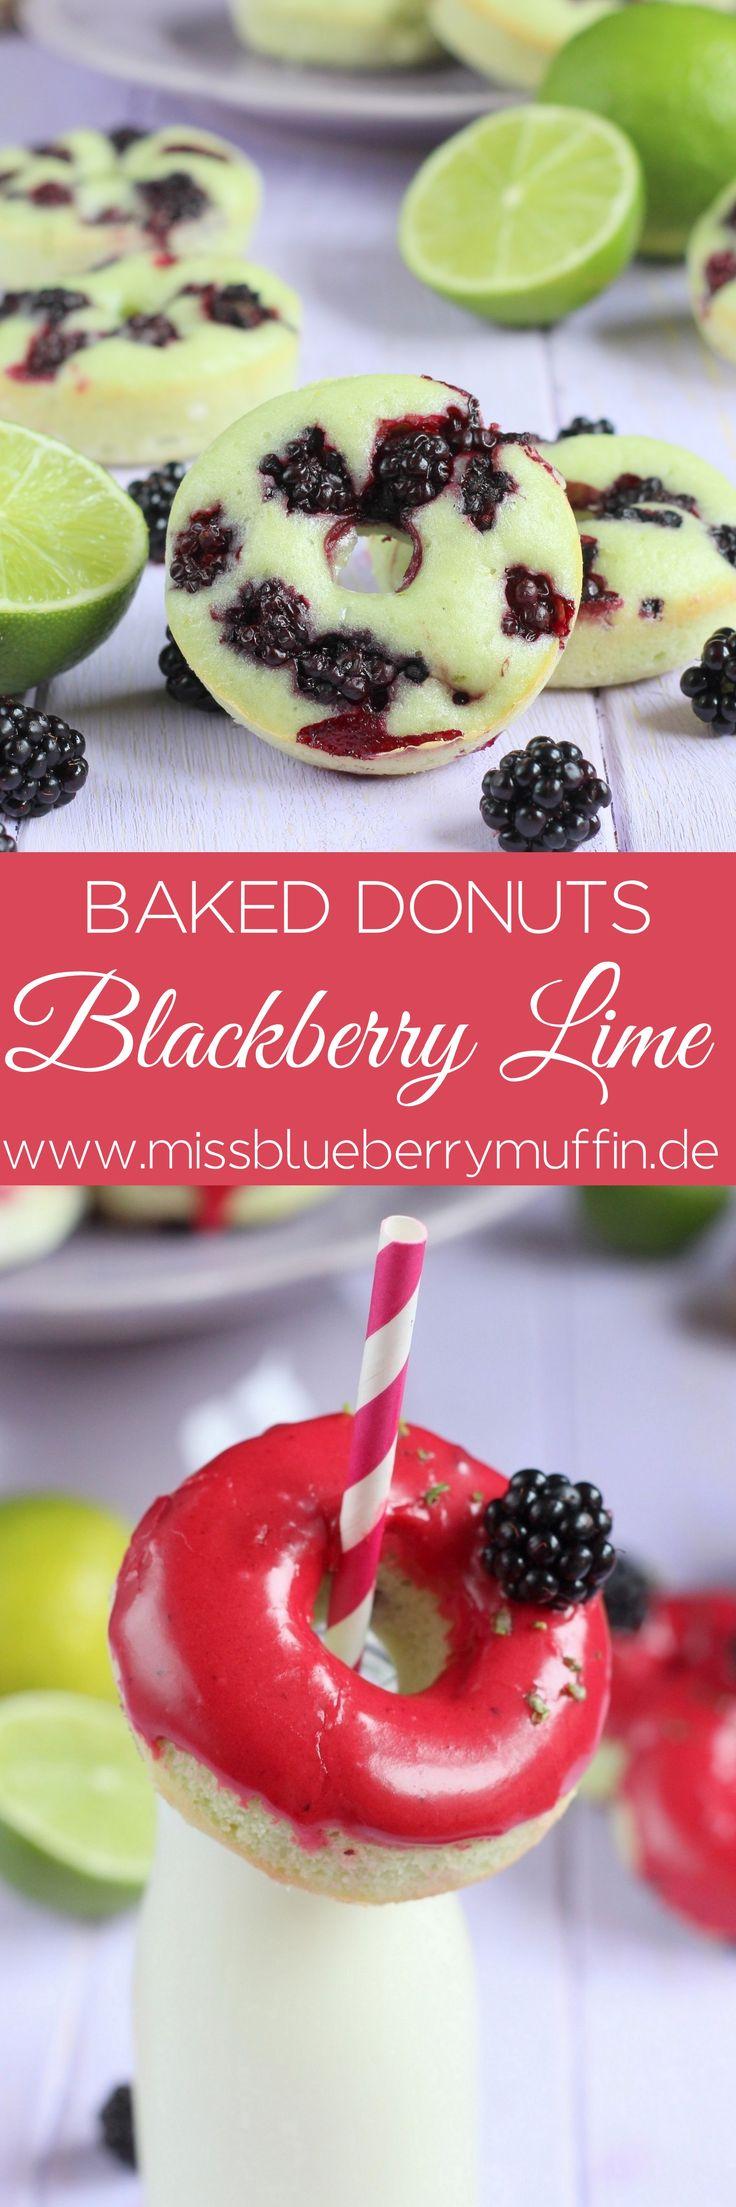 Blackberry Lime baked Donuts // Brombeer-Limetten-Donuts aus dem Backofen <3